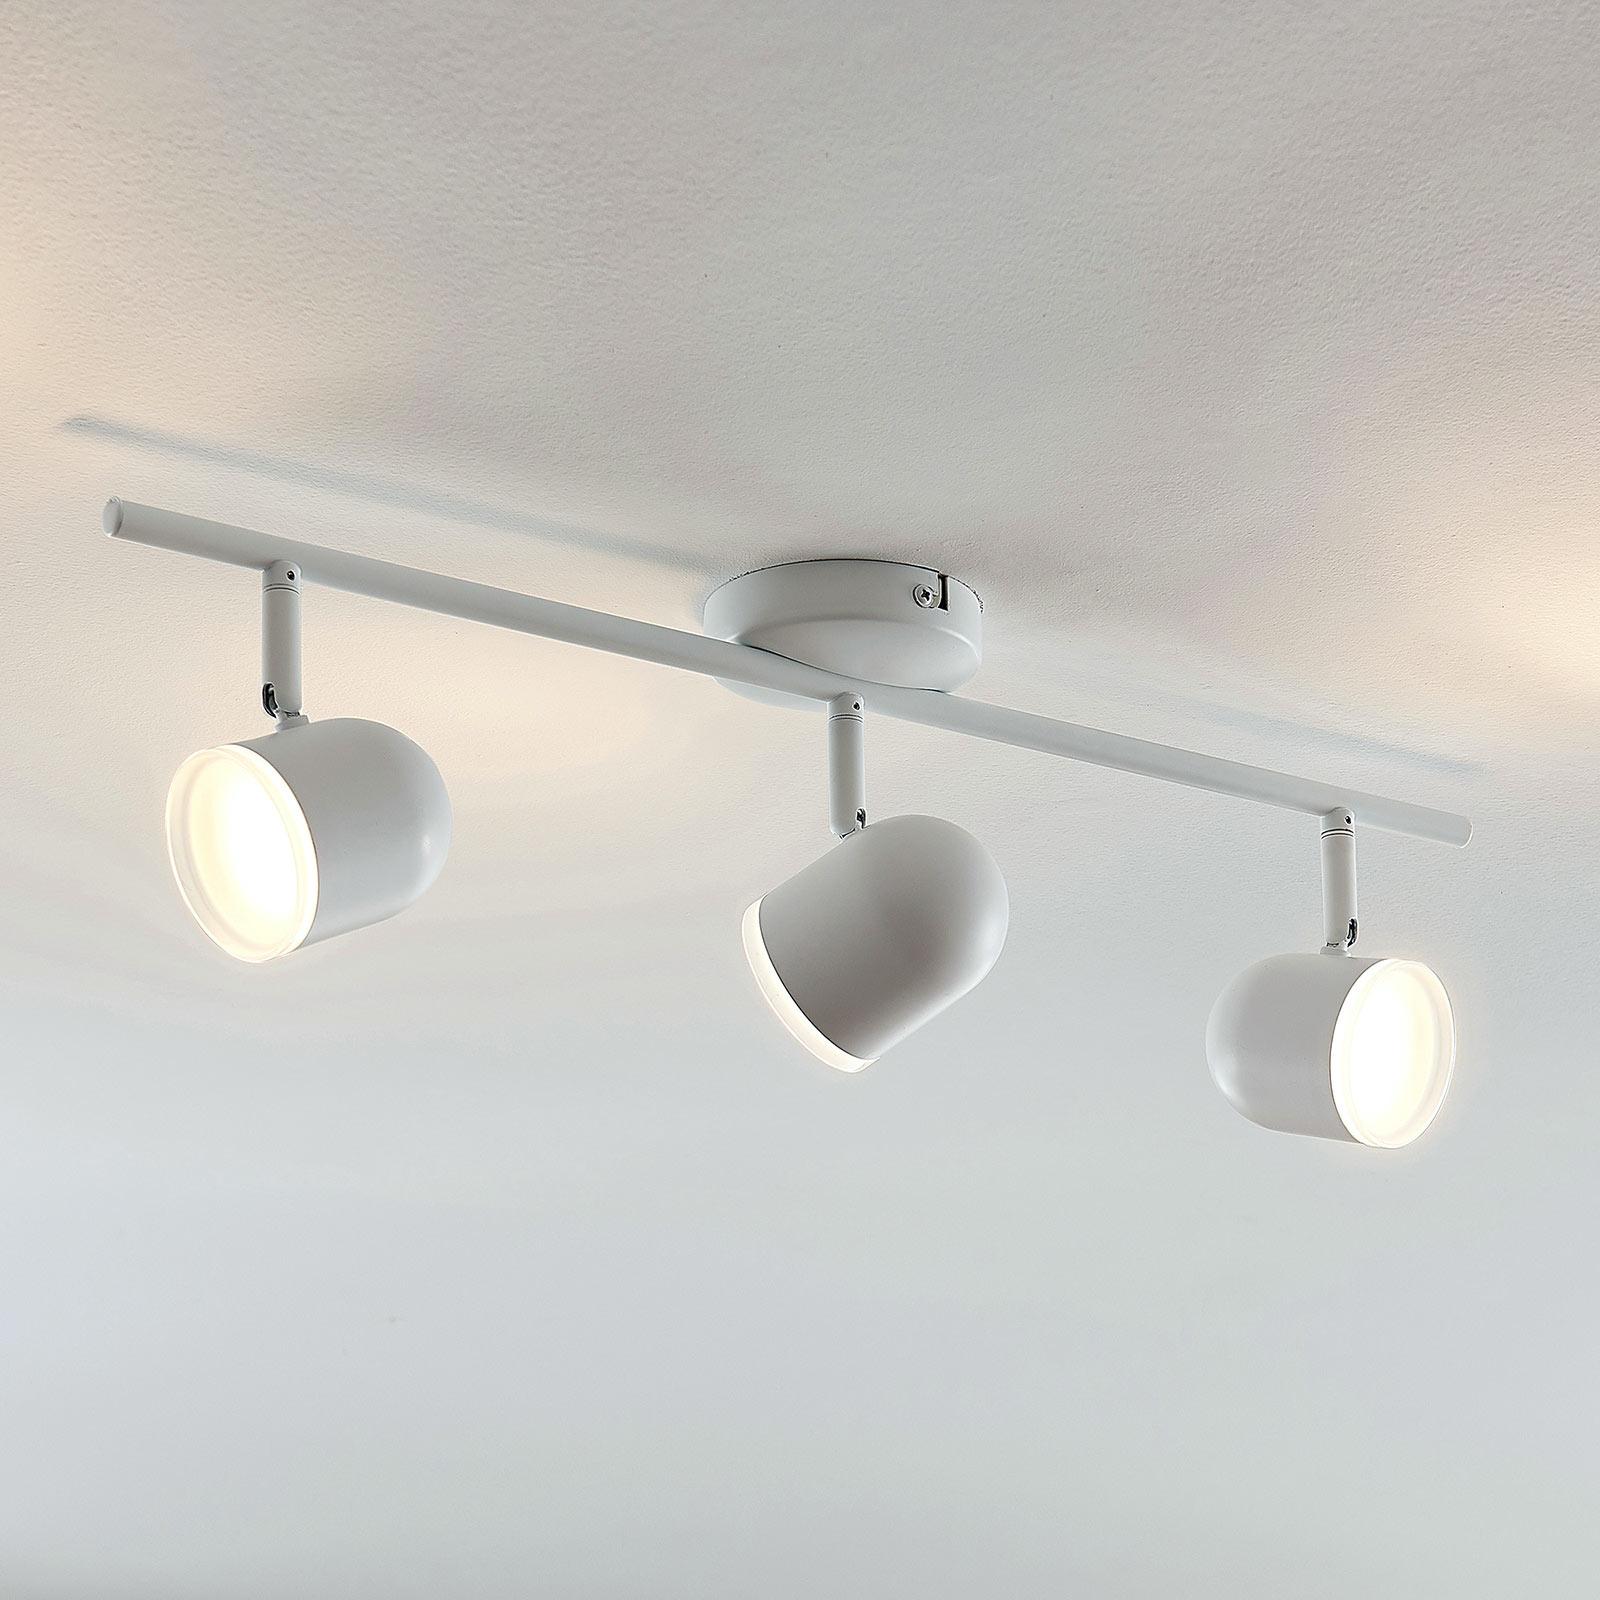 LED plafondlamp Ilka, verstelb, wit, drie lampjes